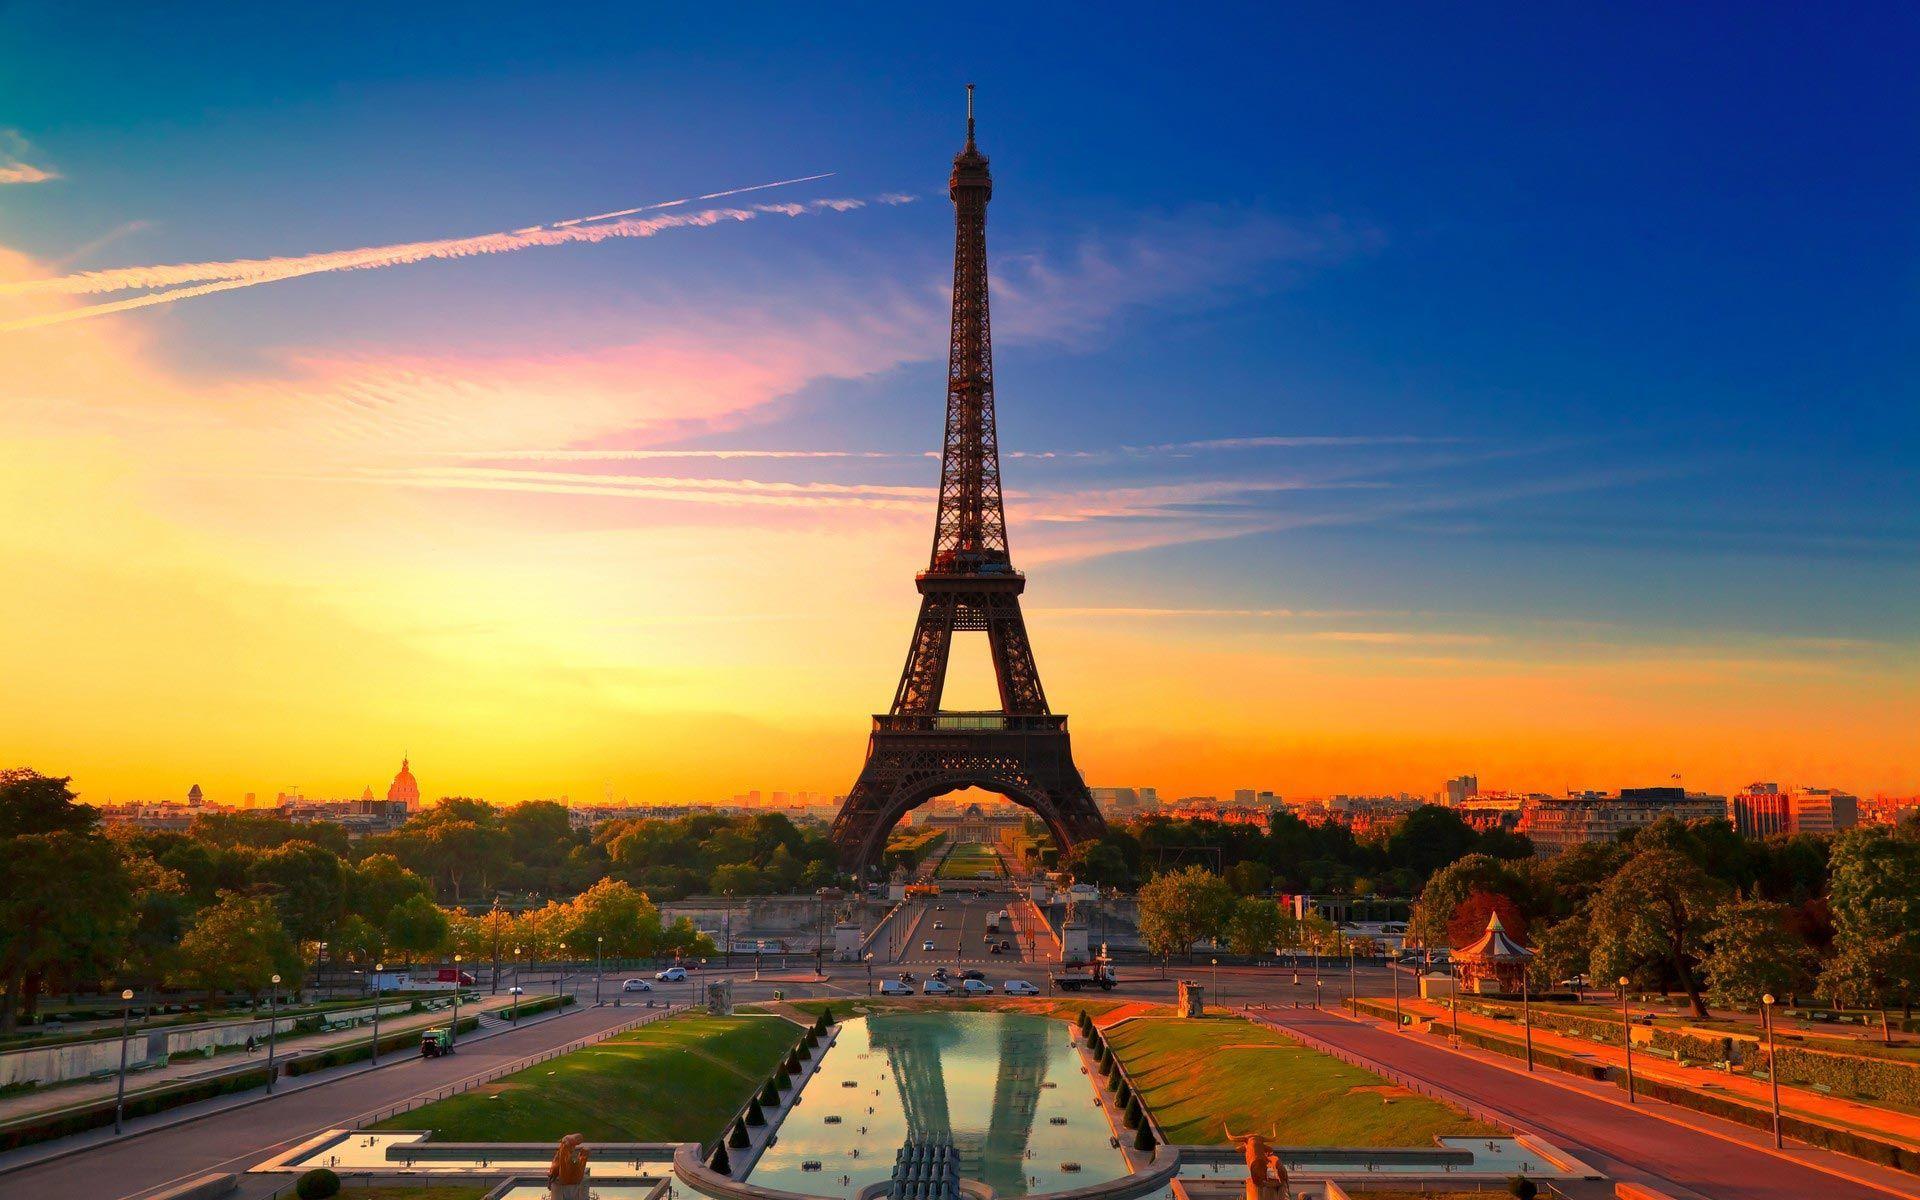 Sunset Paris Eiffel Tower City Landscape Laptop Wallpapers Tumblr Wallpaper Eiffel Tower Tour Eiffel Tower